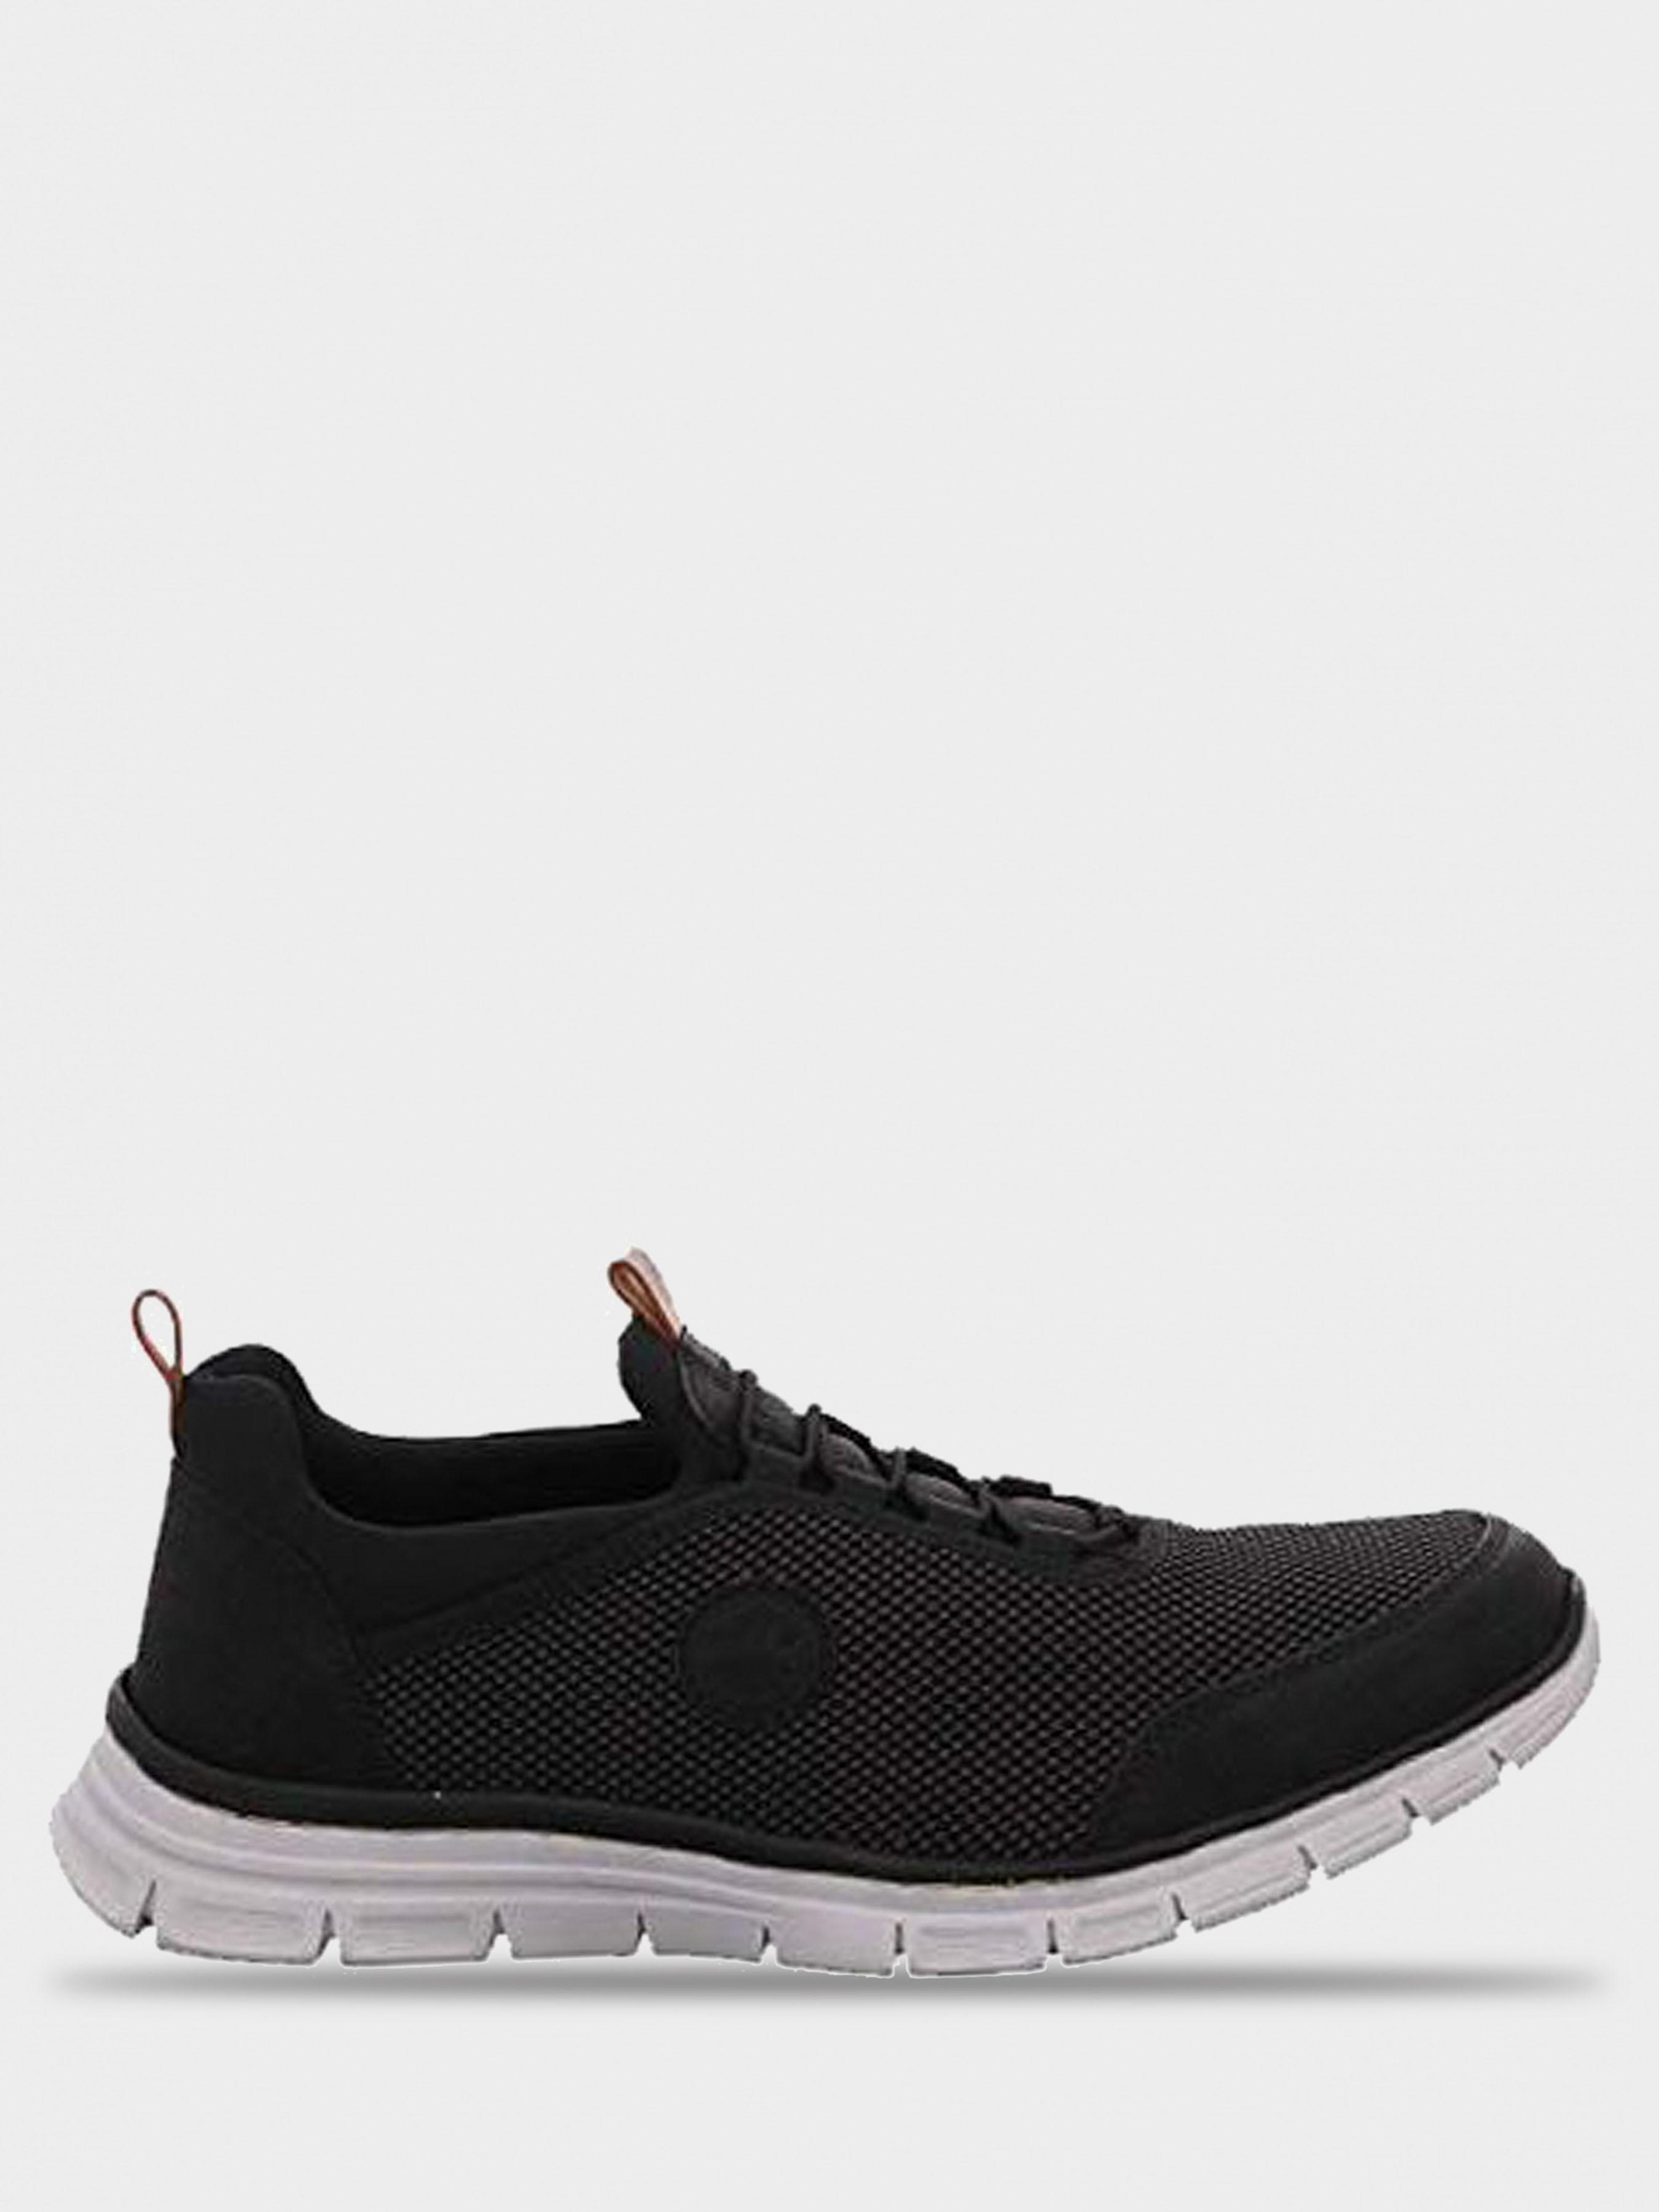 Кроссовки для мужчин RIEKER RK655 размерная сетка обуви, 2017